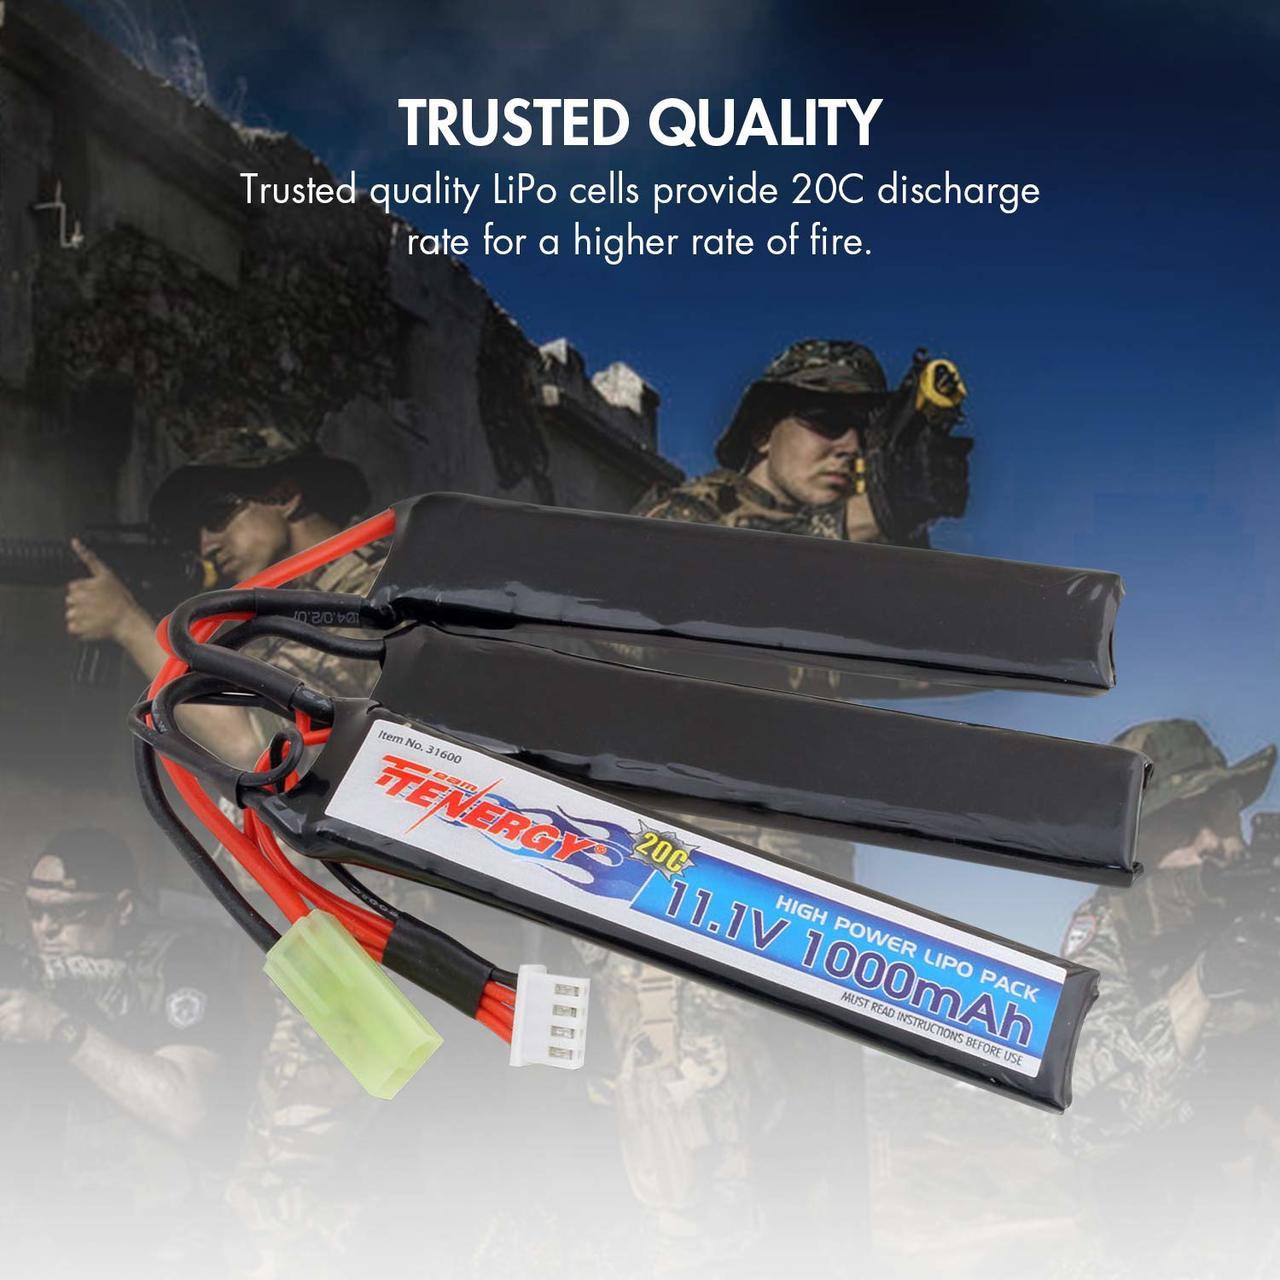 Combo: Tenergy Airsoft Li-Po 11.1V 1000mAh Crane Battery Pack w/ Mini Tamiya Connector + Balance Charger (#01267)